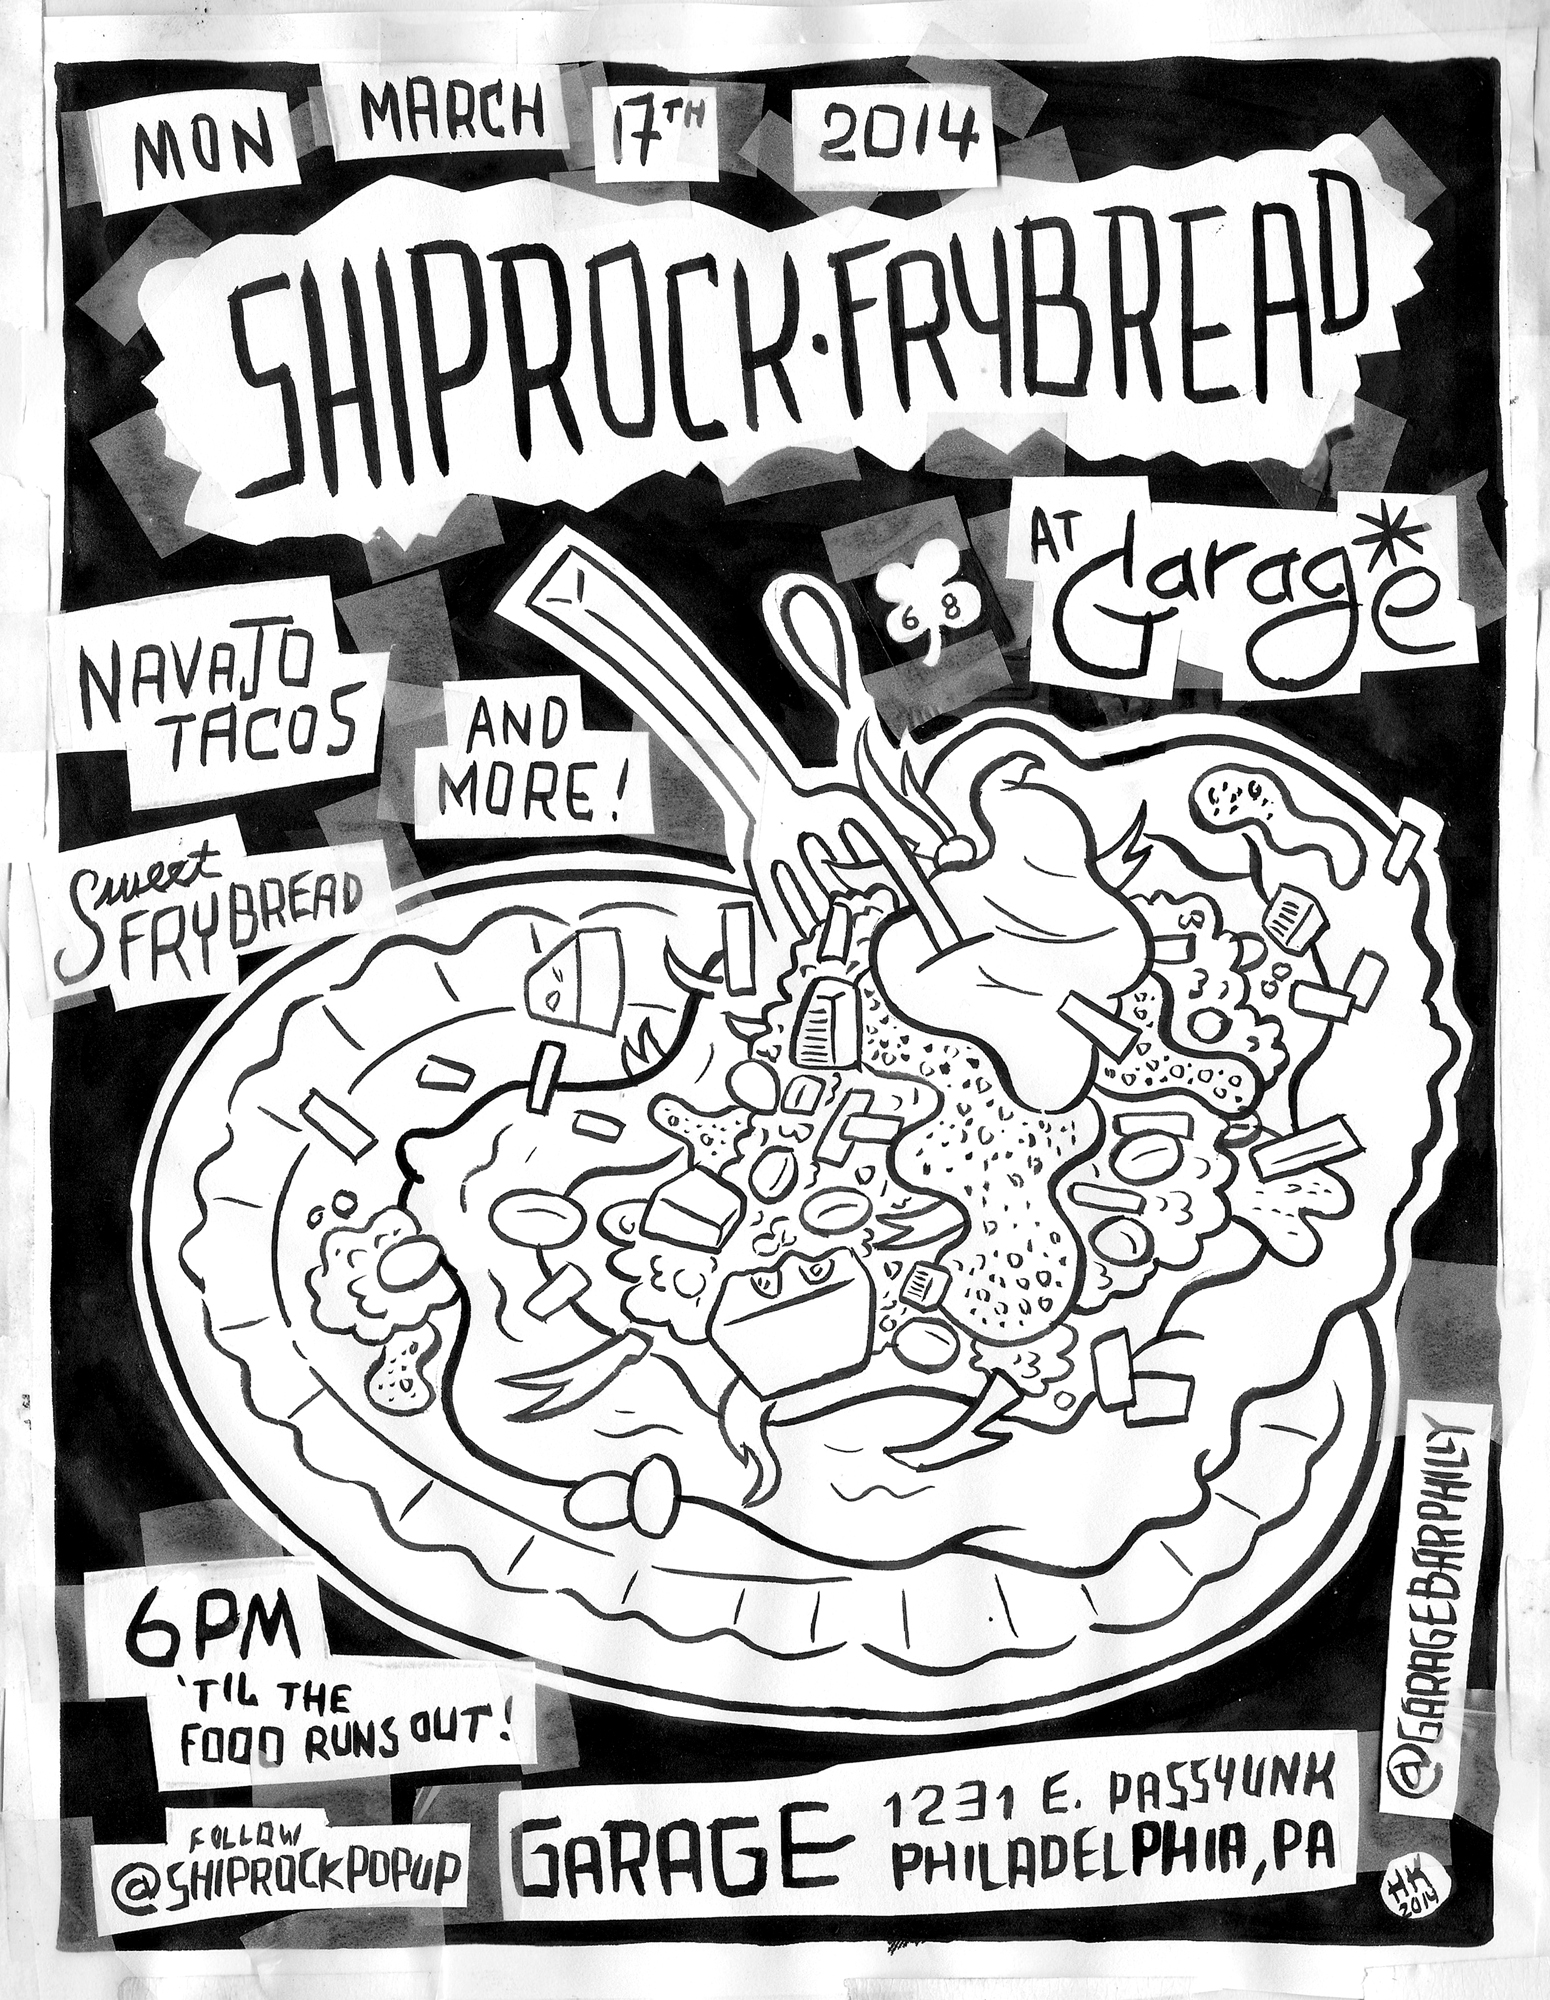 Shiprock-Garage-Lg copy